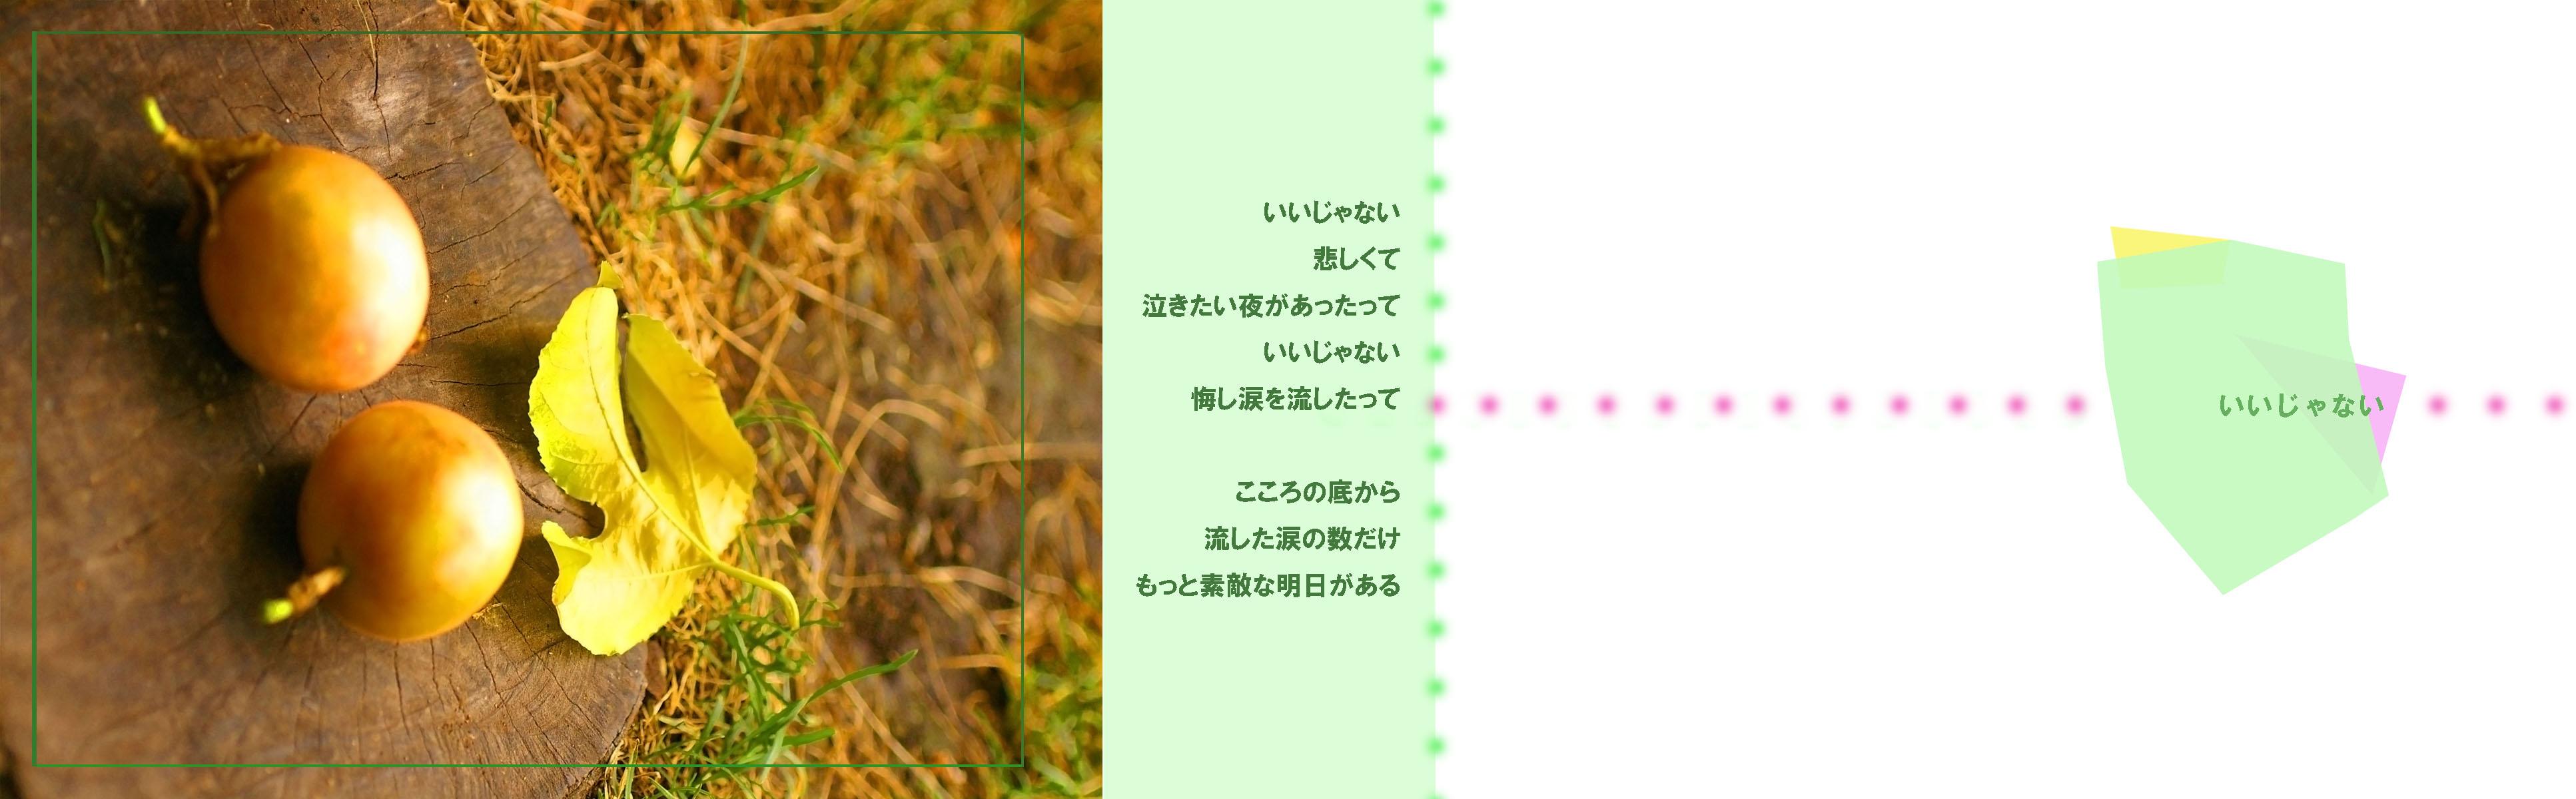 c0112724_21581610.jpg